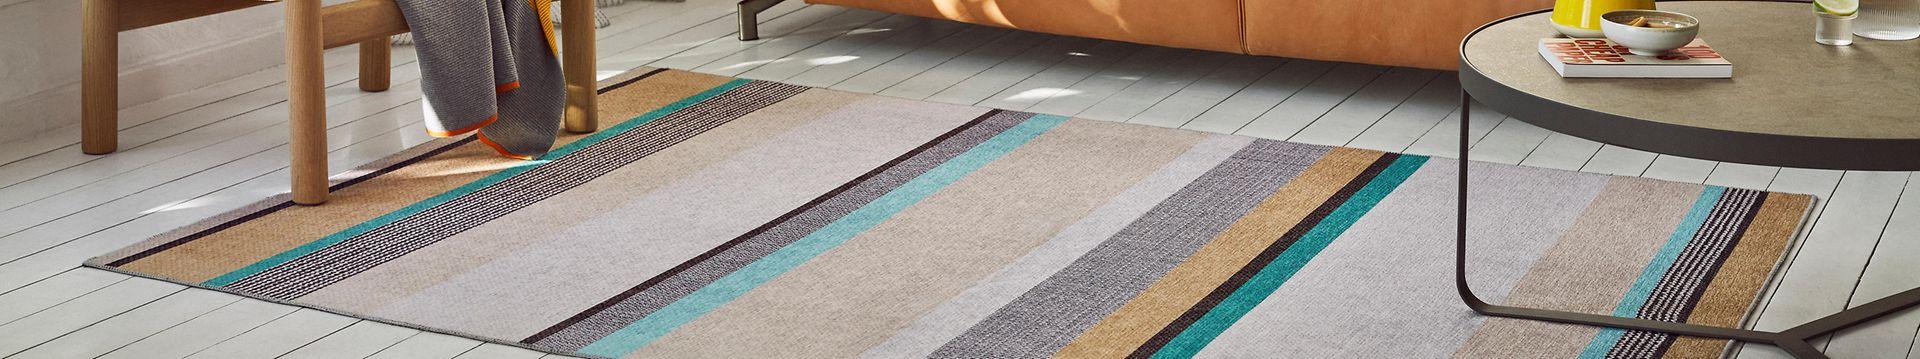 222021 - Home - Carpets - TC banner - IMG